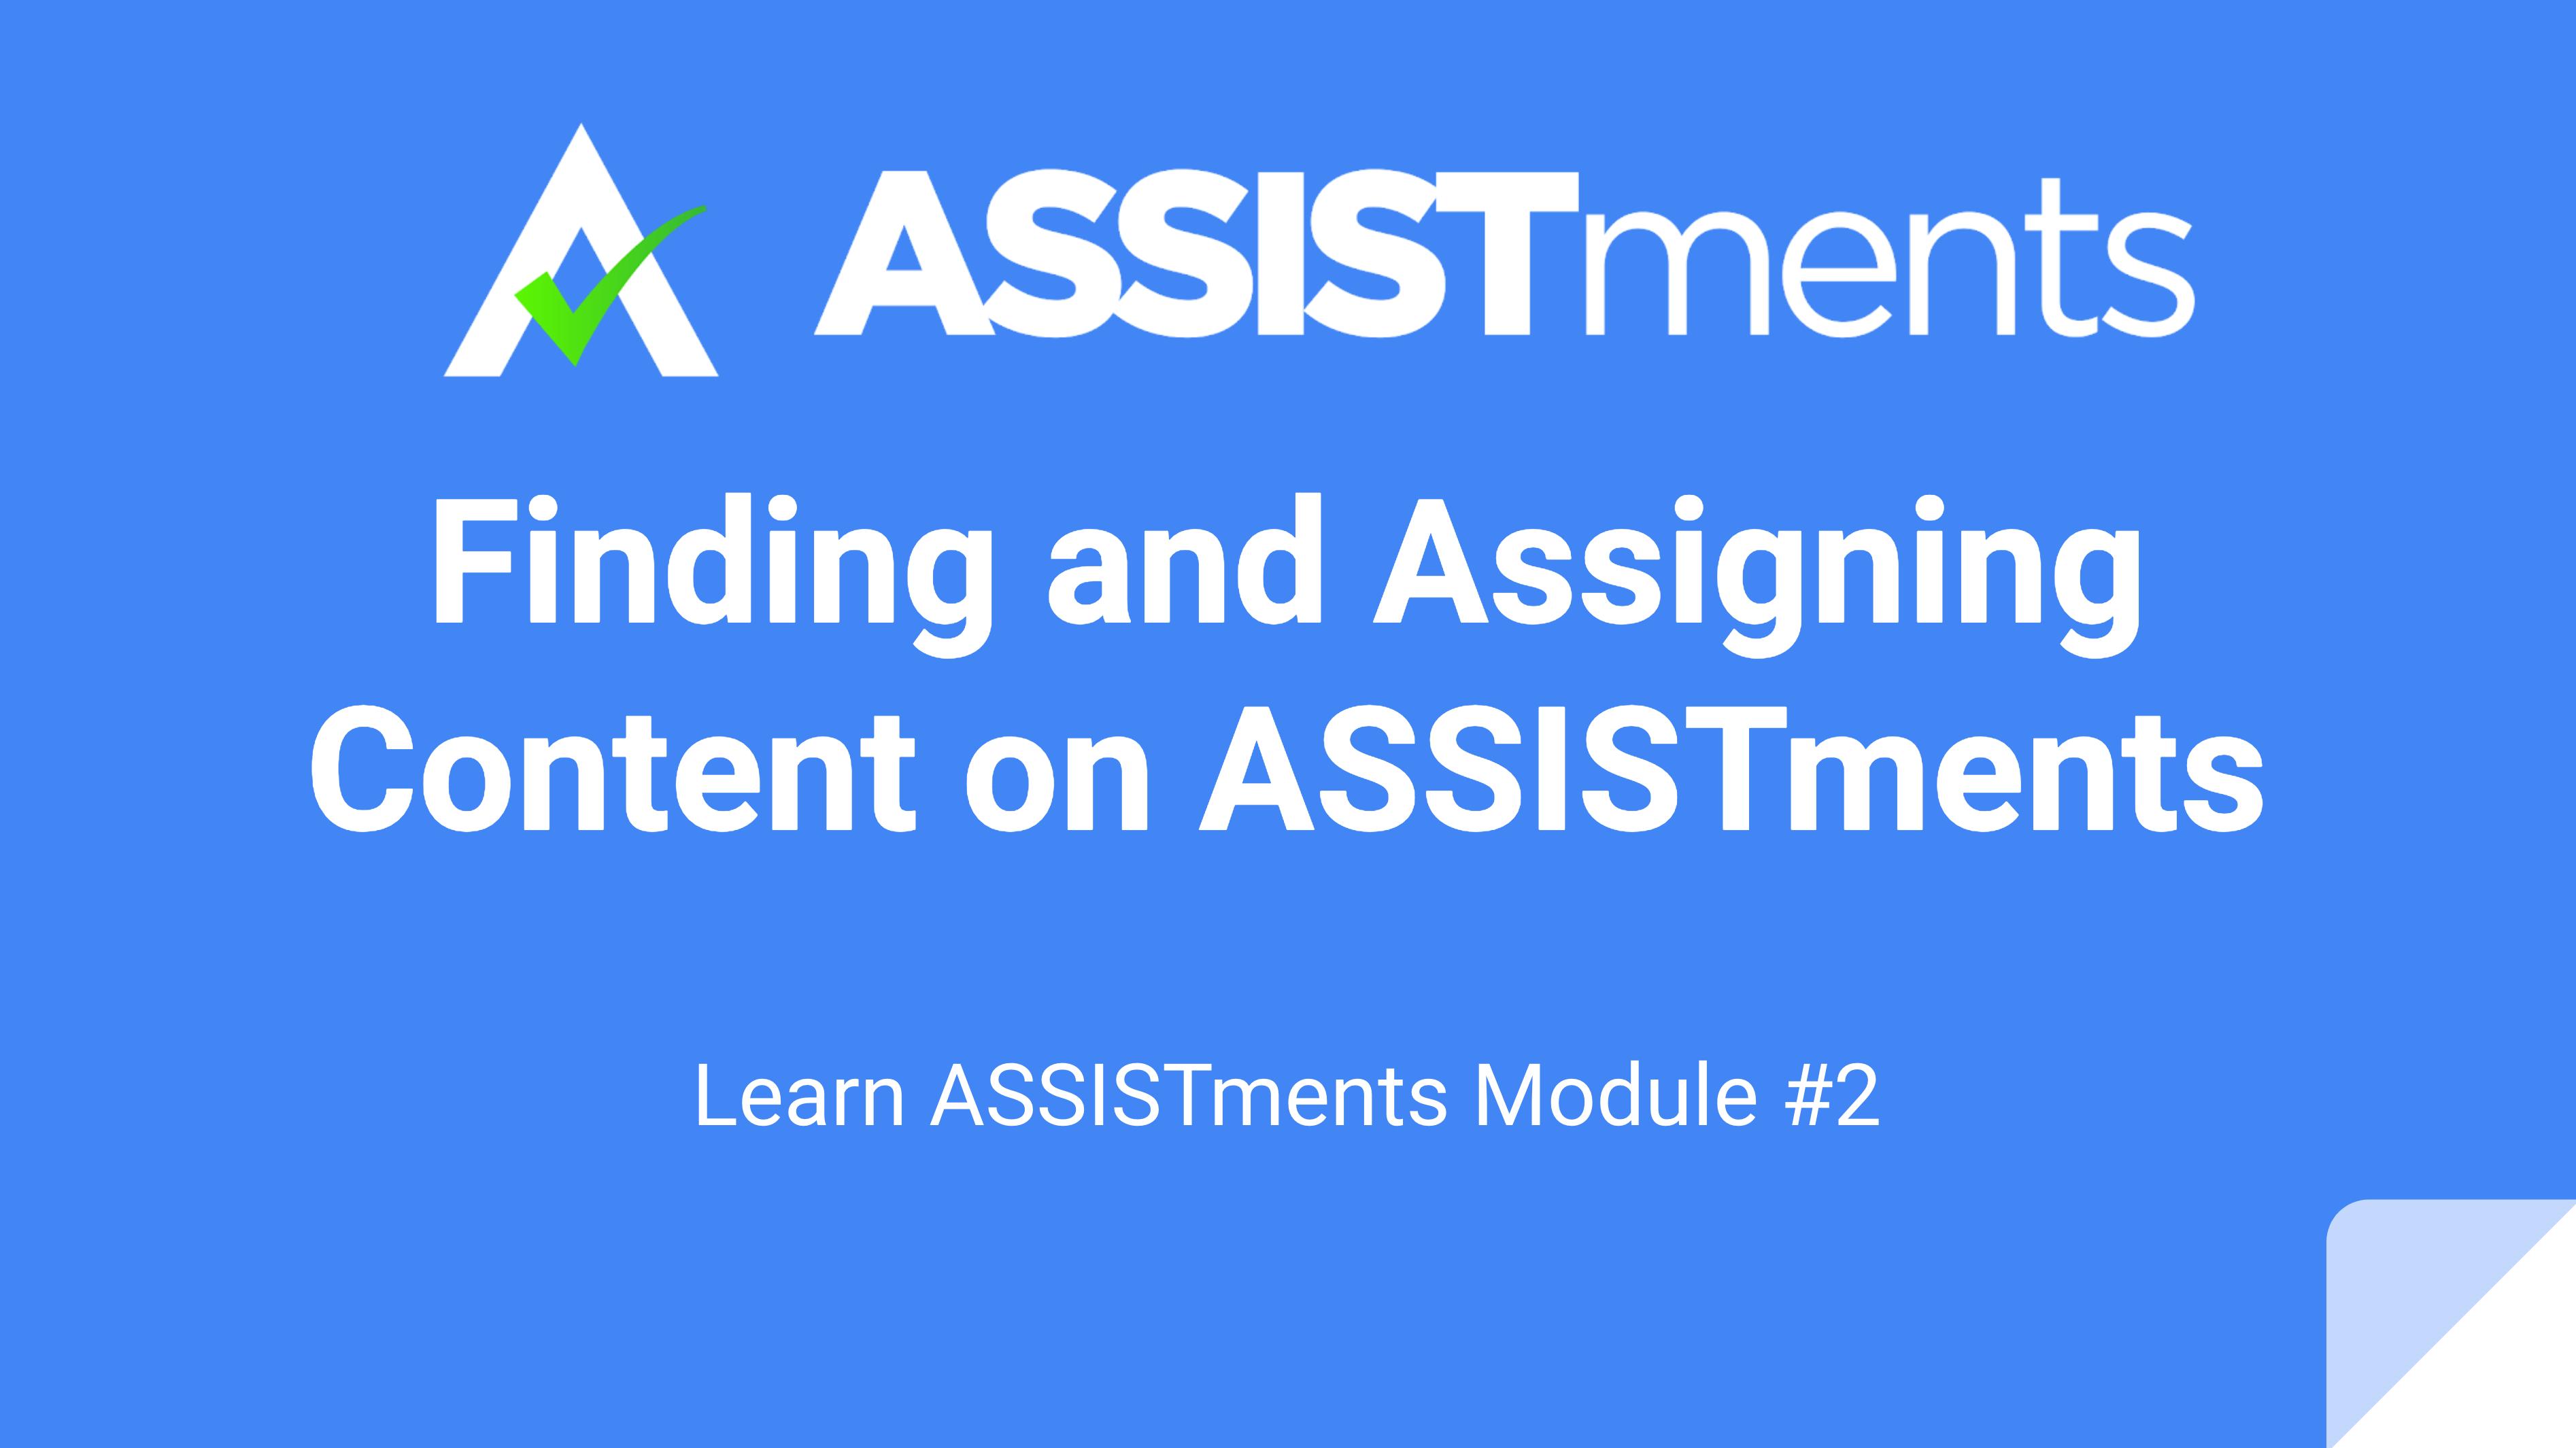 Learn ASSISTments Module #2